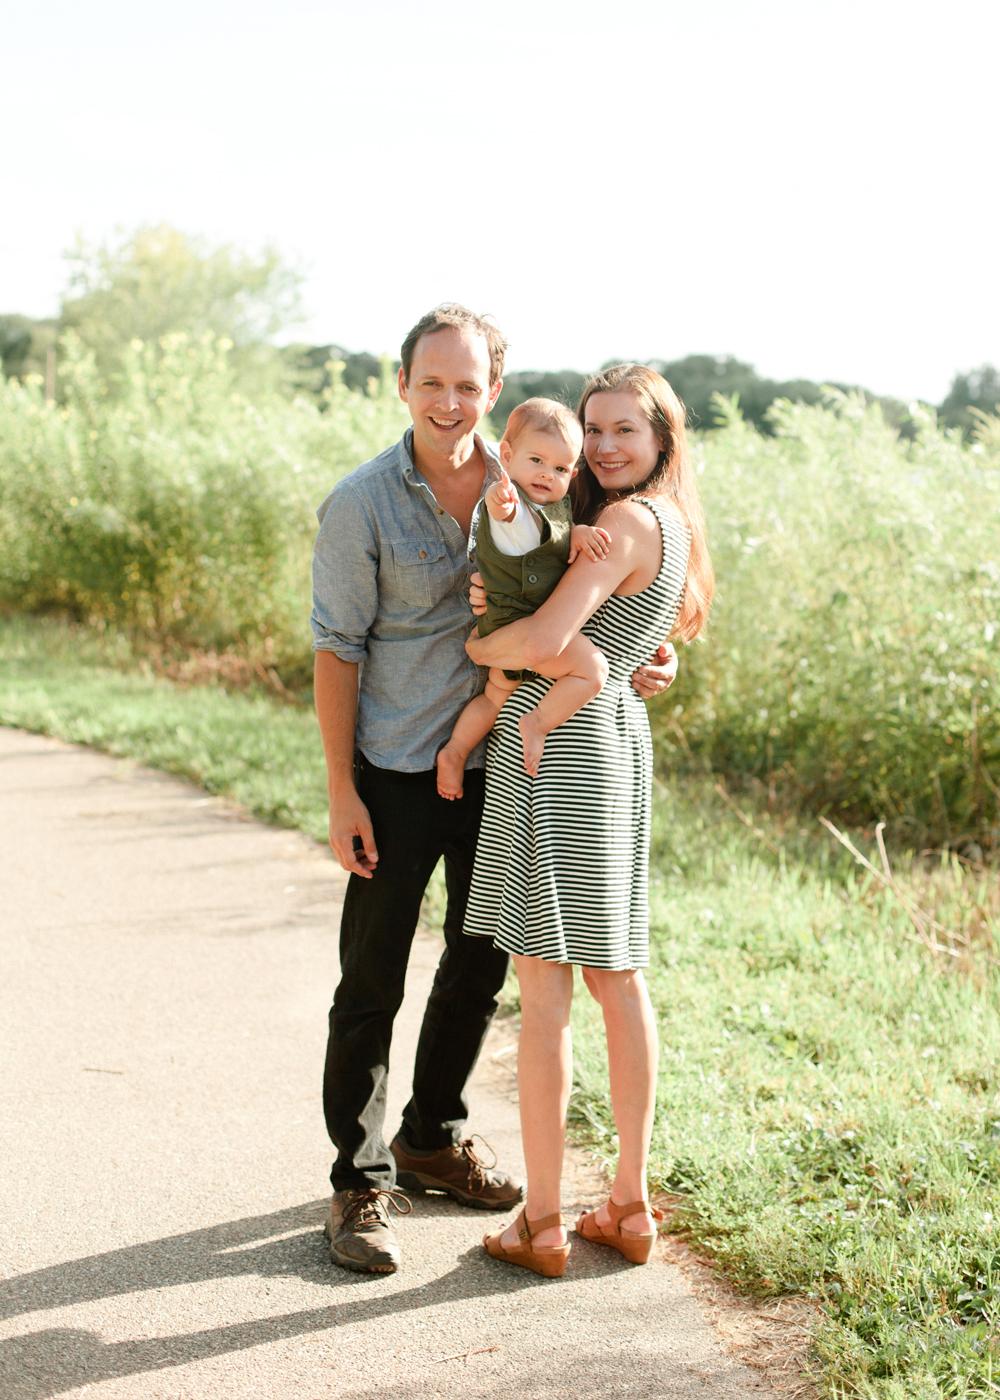 Outdoor Family Photography Minneapolis